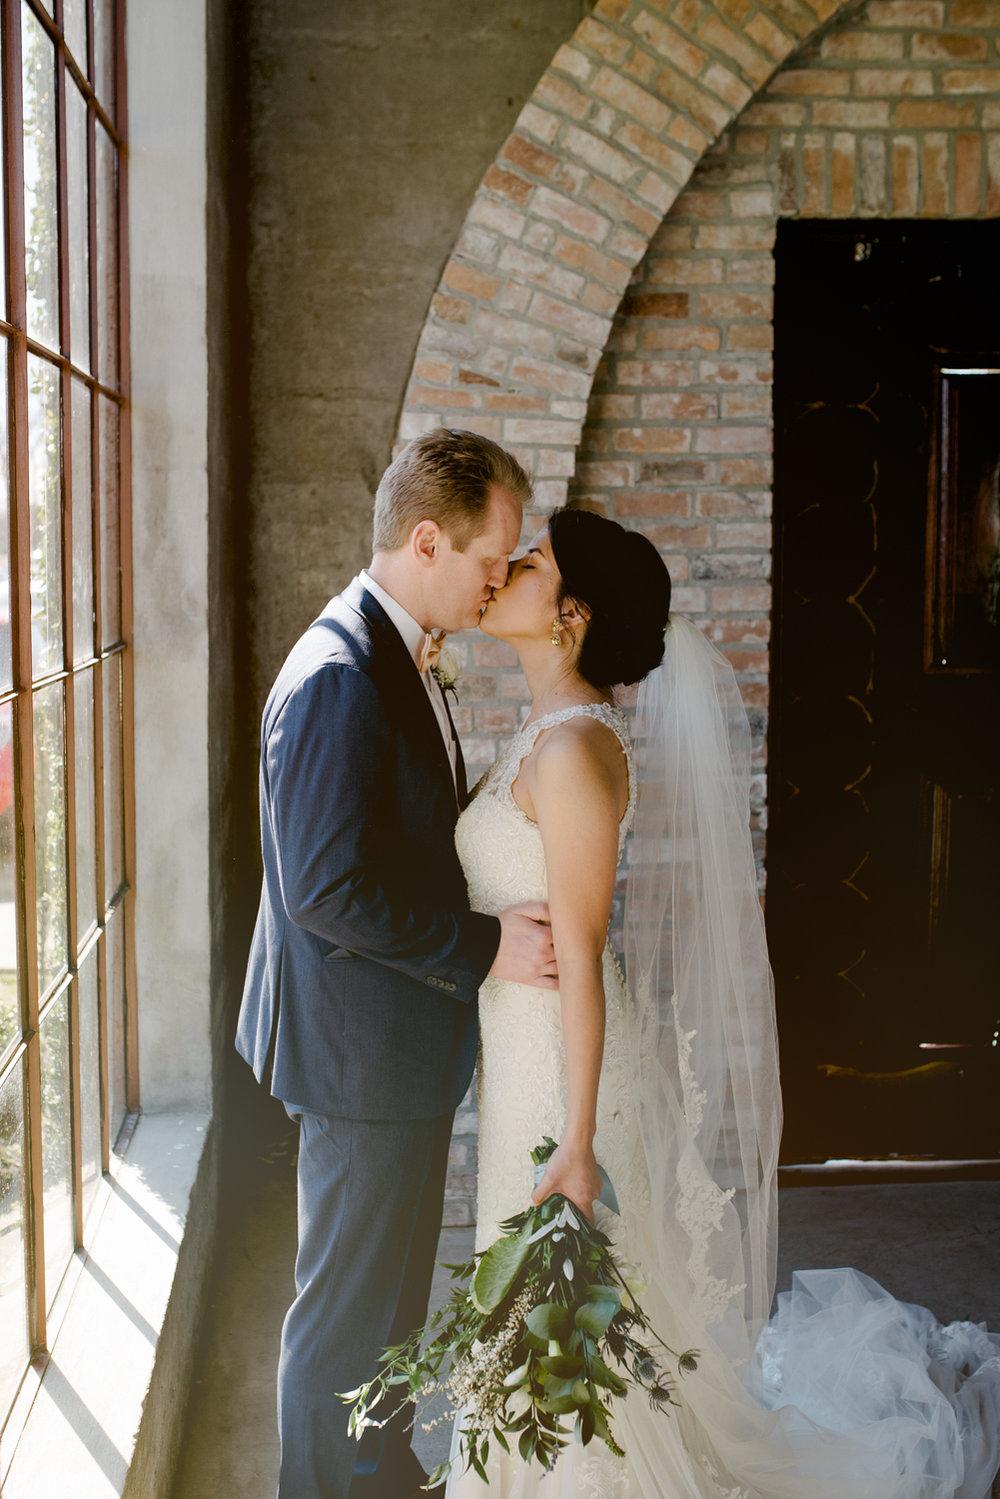 casperwedding-texasweddings-houstonweddings-oldedobbestation-montgomerytx-montgomeryweddings-bride-groom-bridalparty-weddingdress-63.jpg